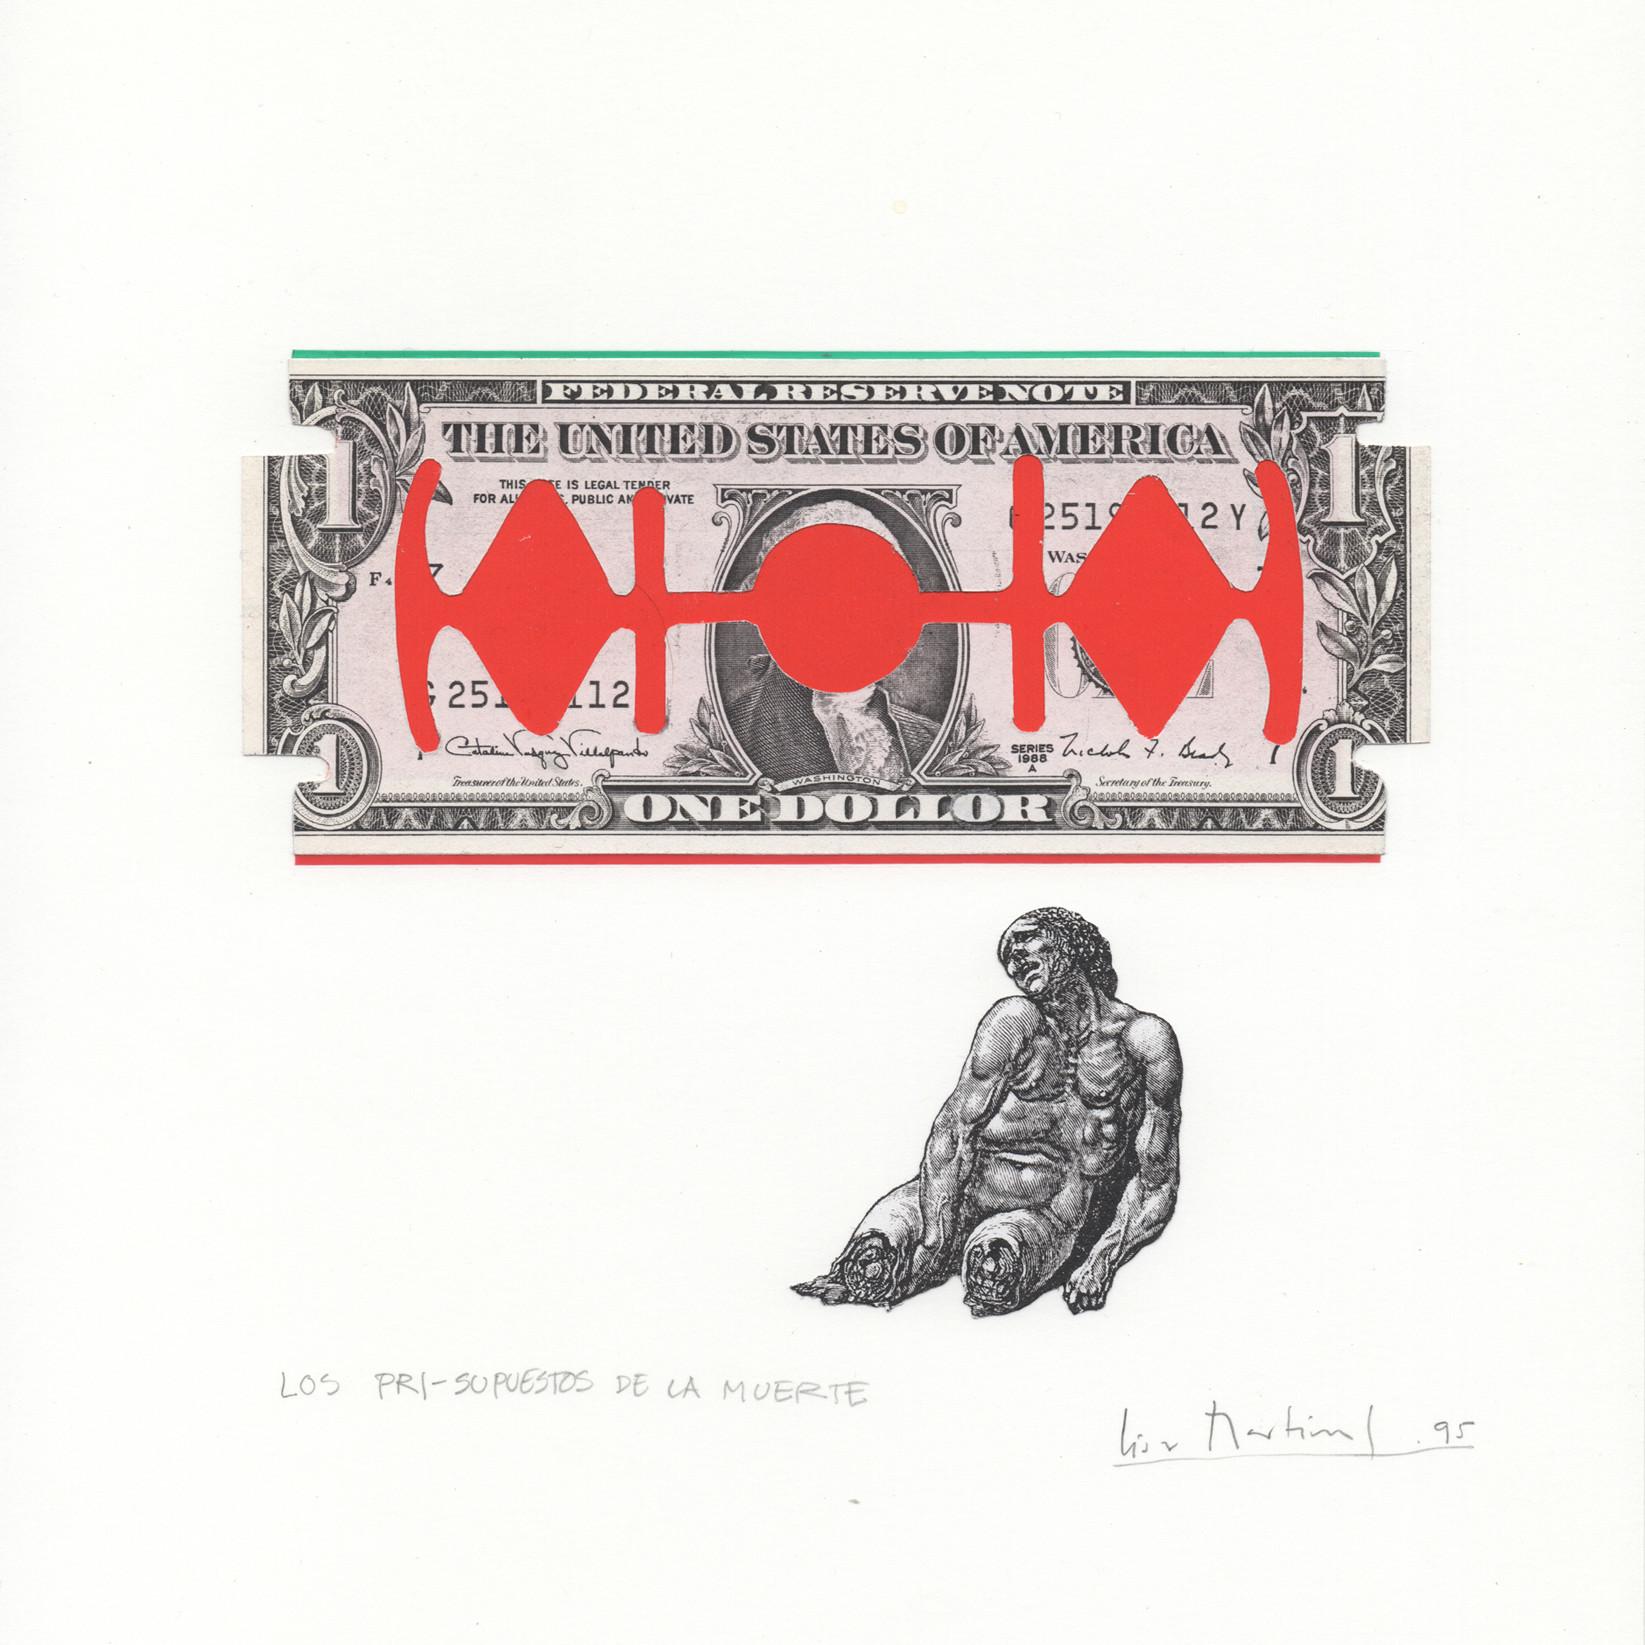 """Los PRI-supuestos de la muerte,"" 1996, by César Martínez, at the Armory Center — a work that took on the Mexican ruling party."